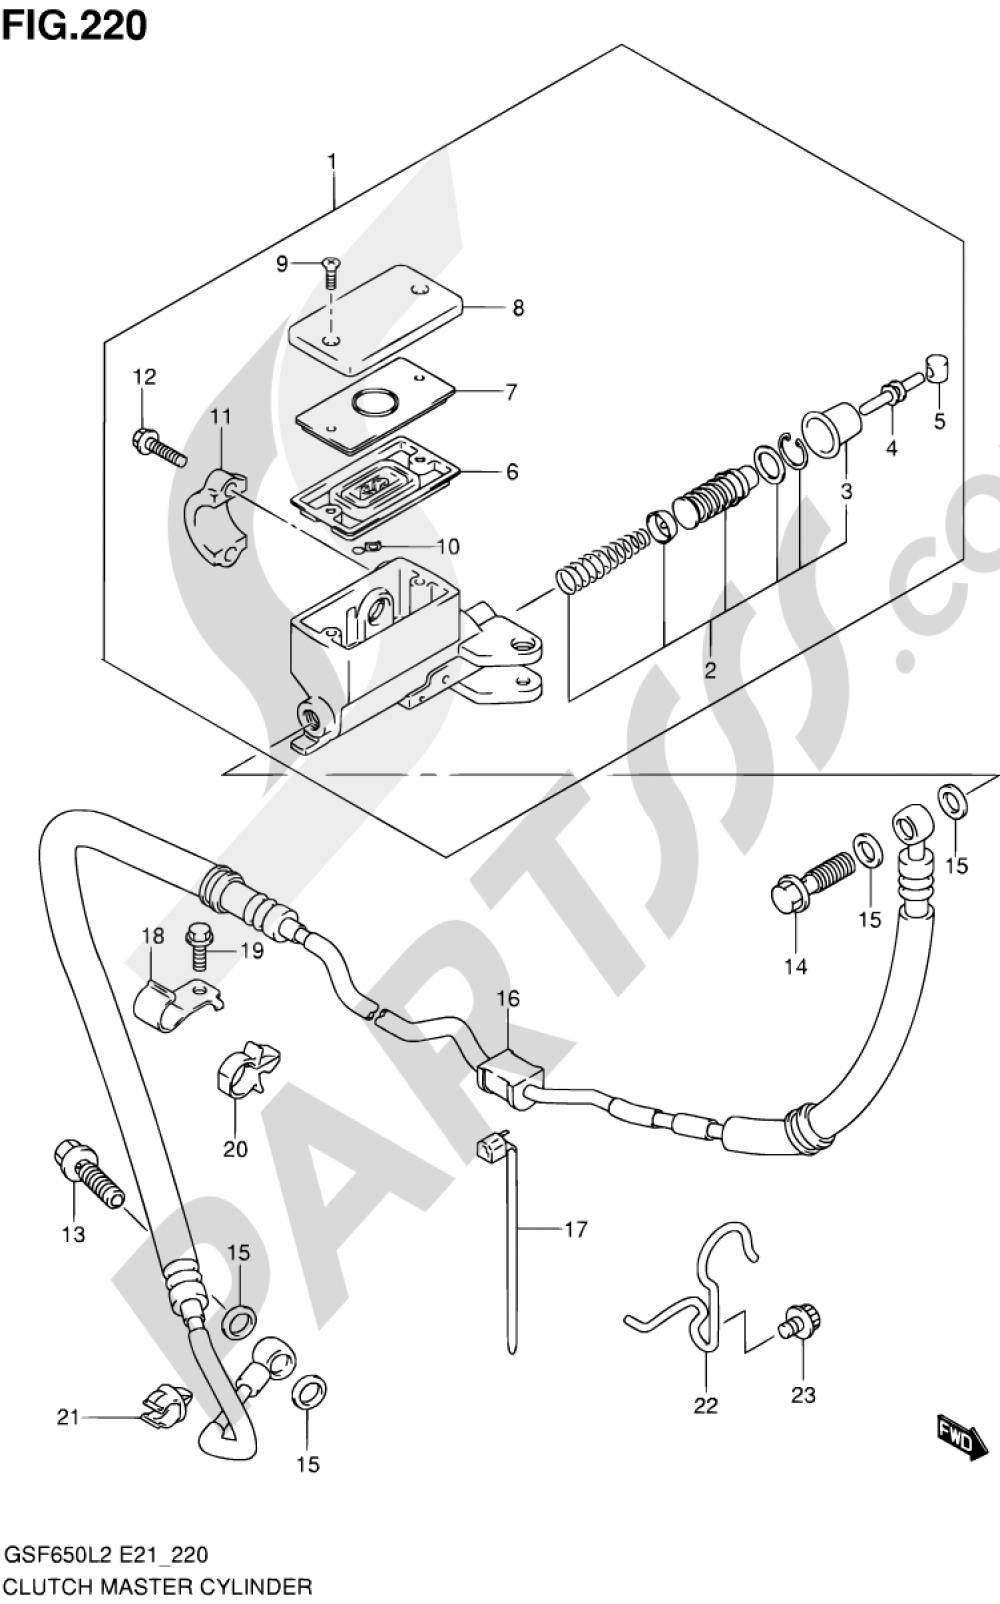 220 - CLUTCH MASTER CYLINDER (GSF650SUAL2 E21) Suzuki BANDIT GSF650S 2012